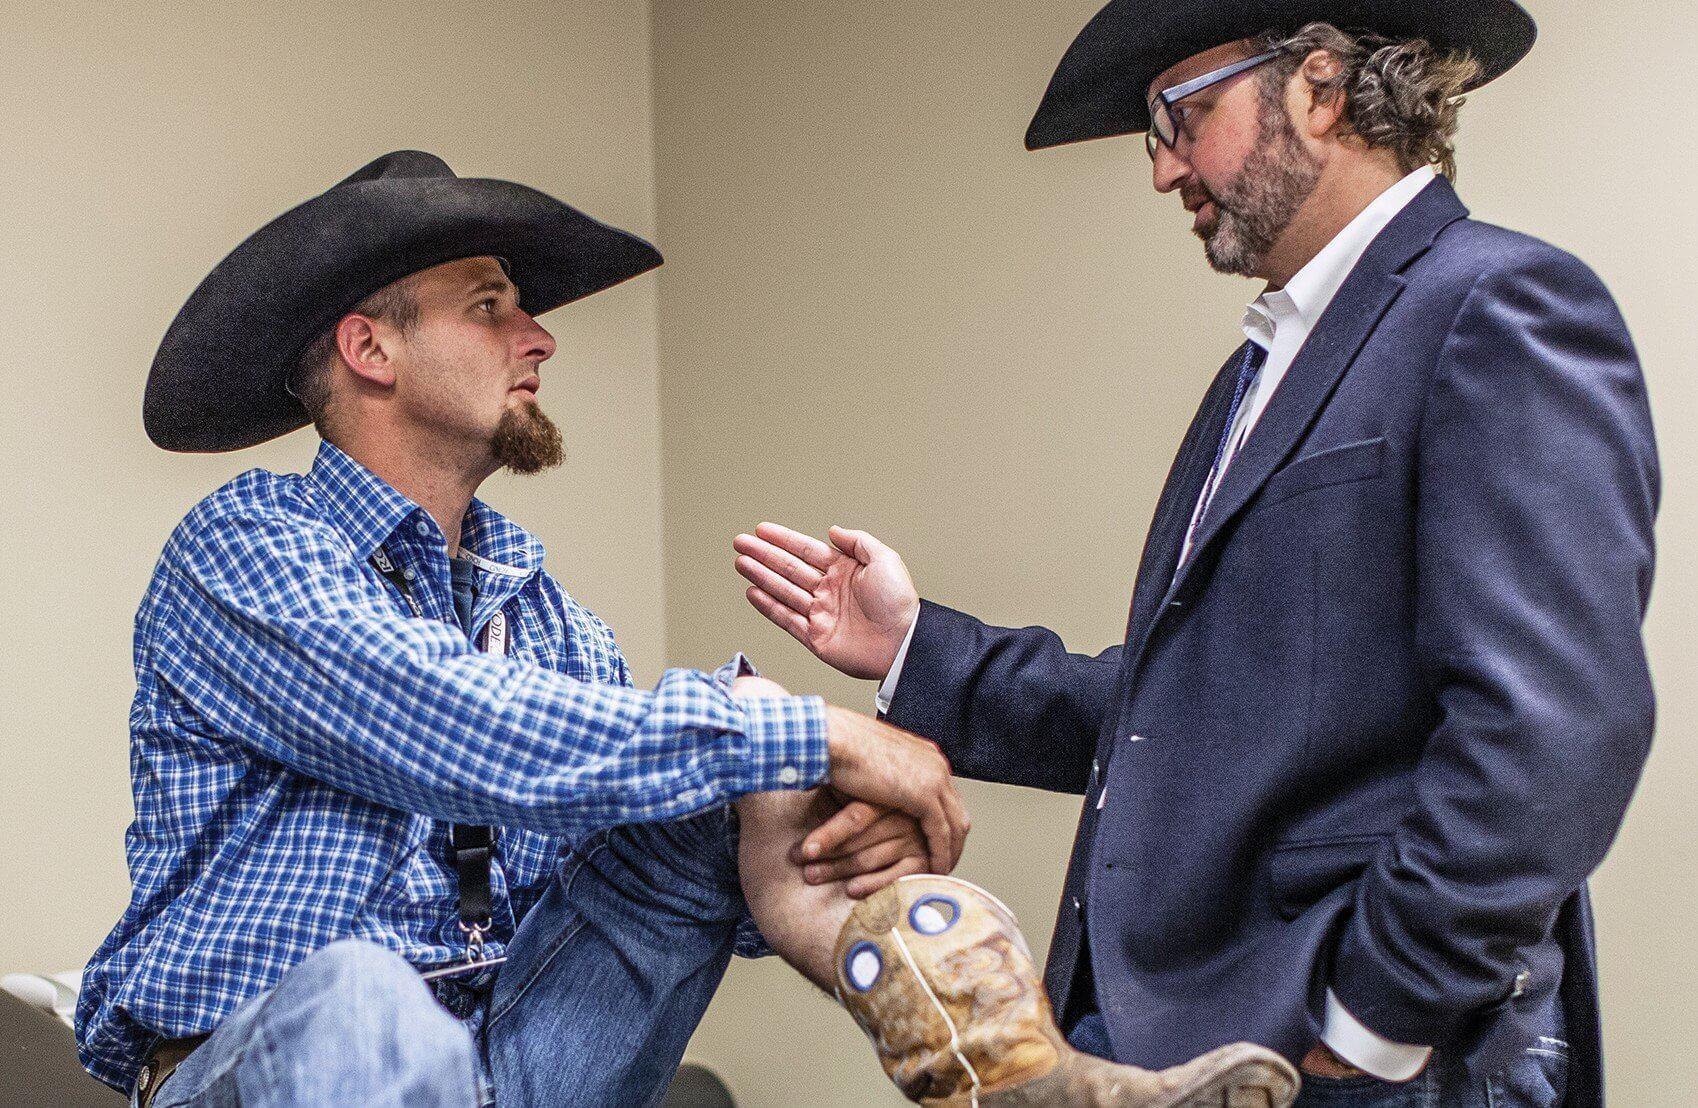 Stripping chute worker Michael Ondrusek, left, consults Patrick McCulloch, M.D., a Houston Methodist orthopedic surgeon.